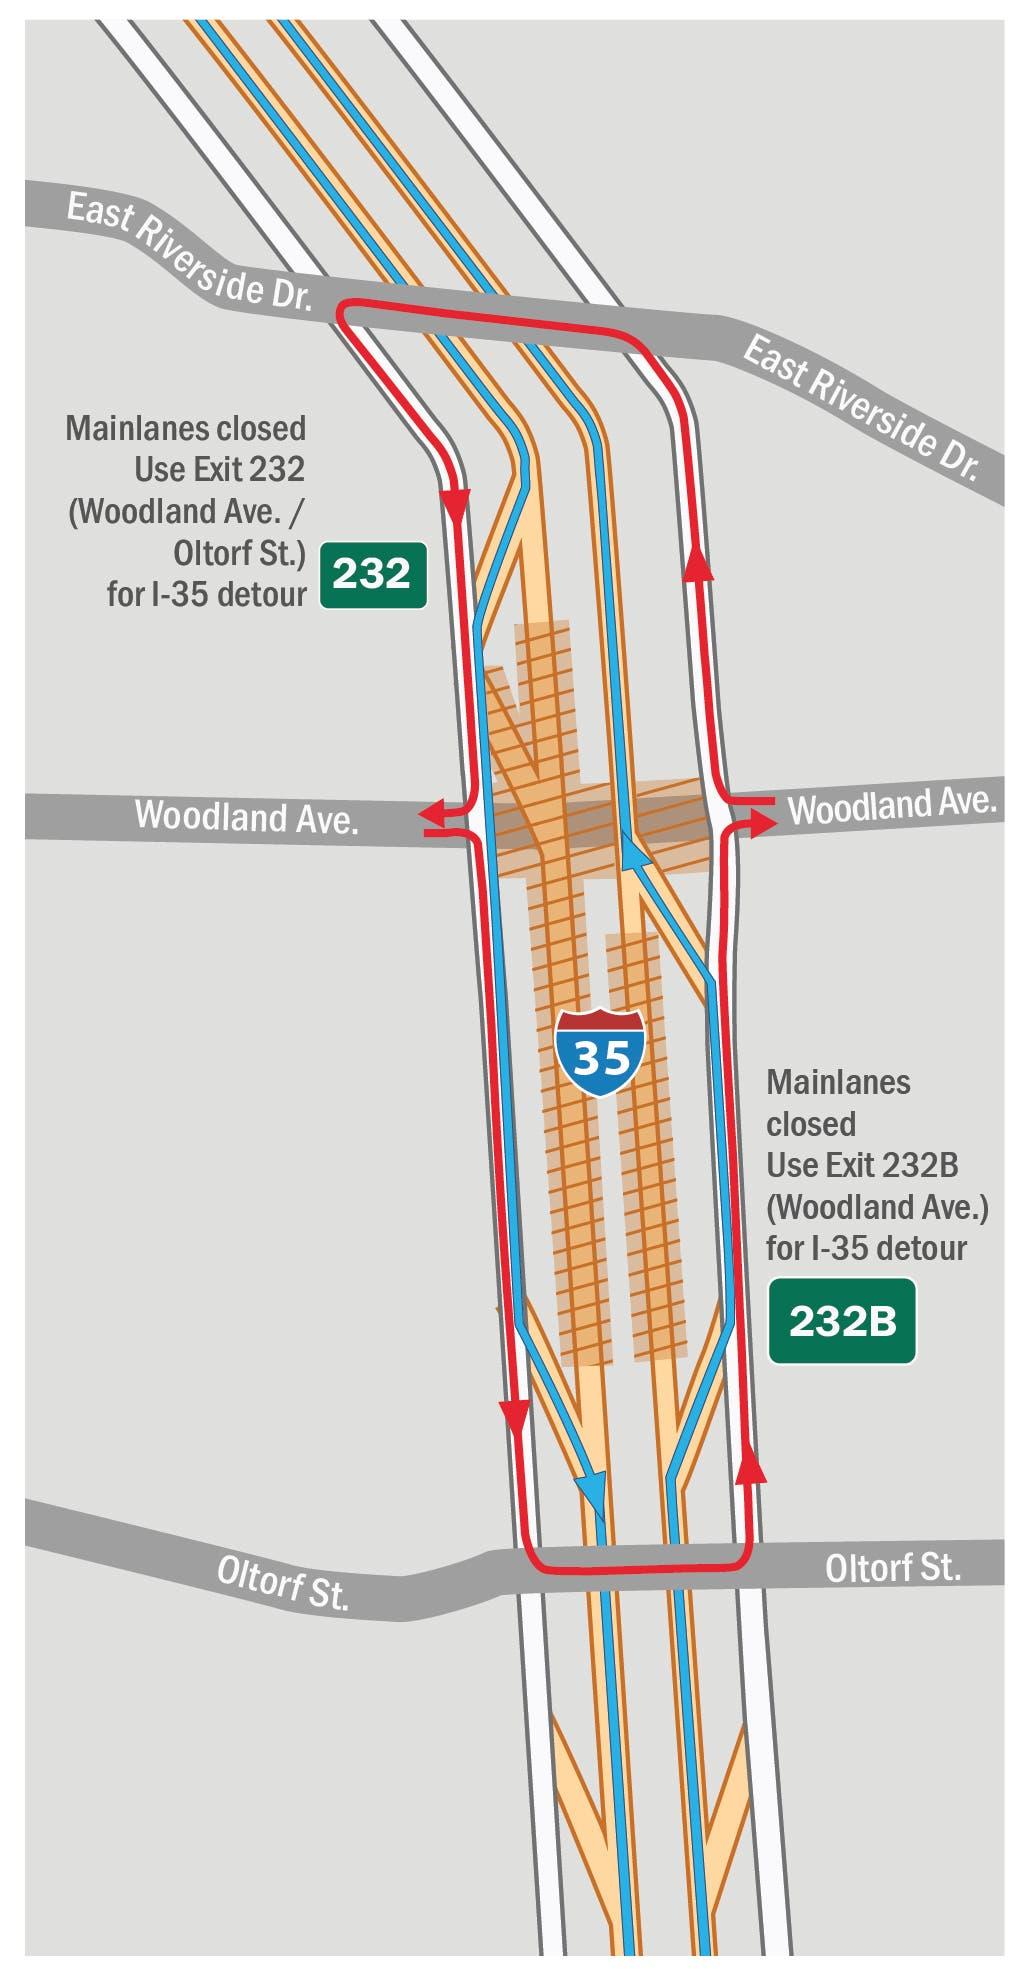 Interstate 35 Lane Closures In South Austin Postponed